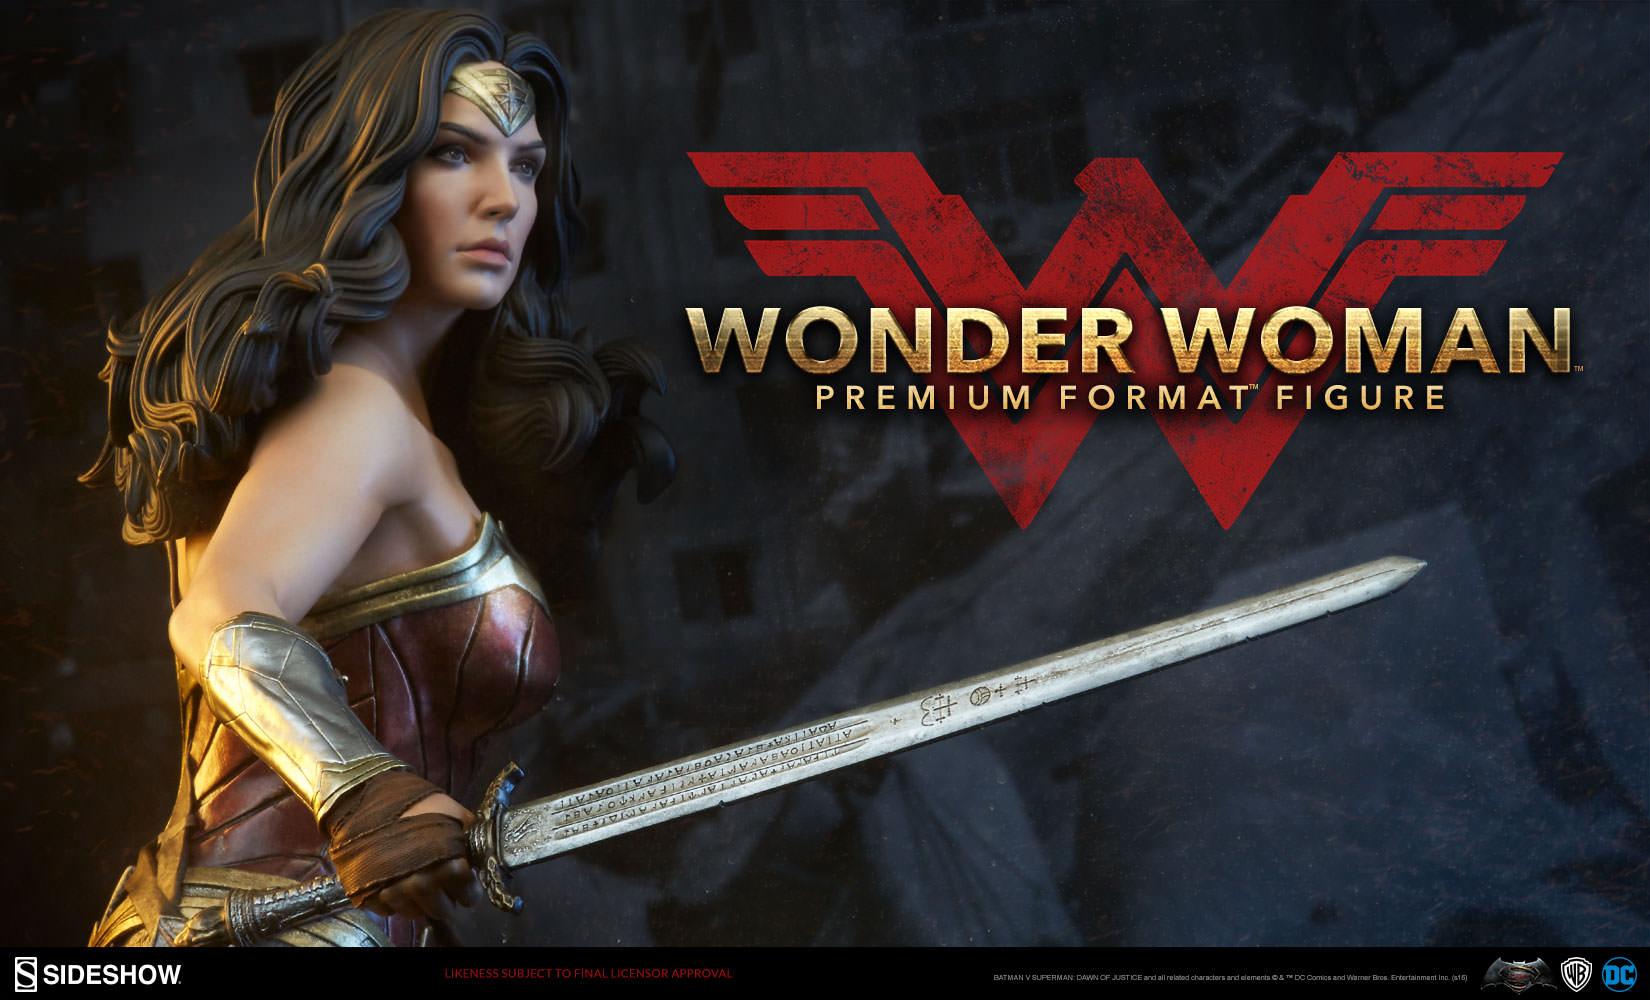 dc-comics-batman-vs-superman-wonder-woman-premium-format-figure-01